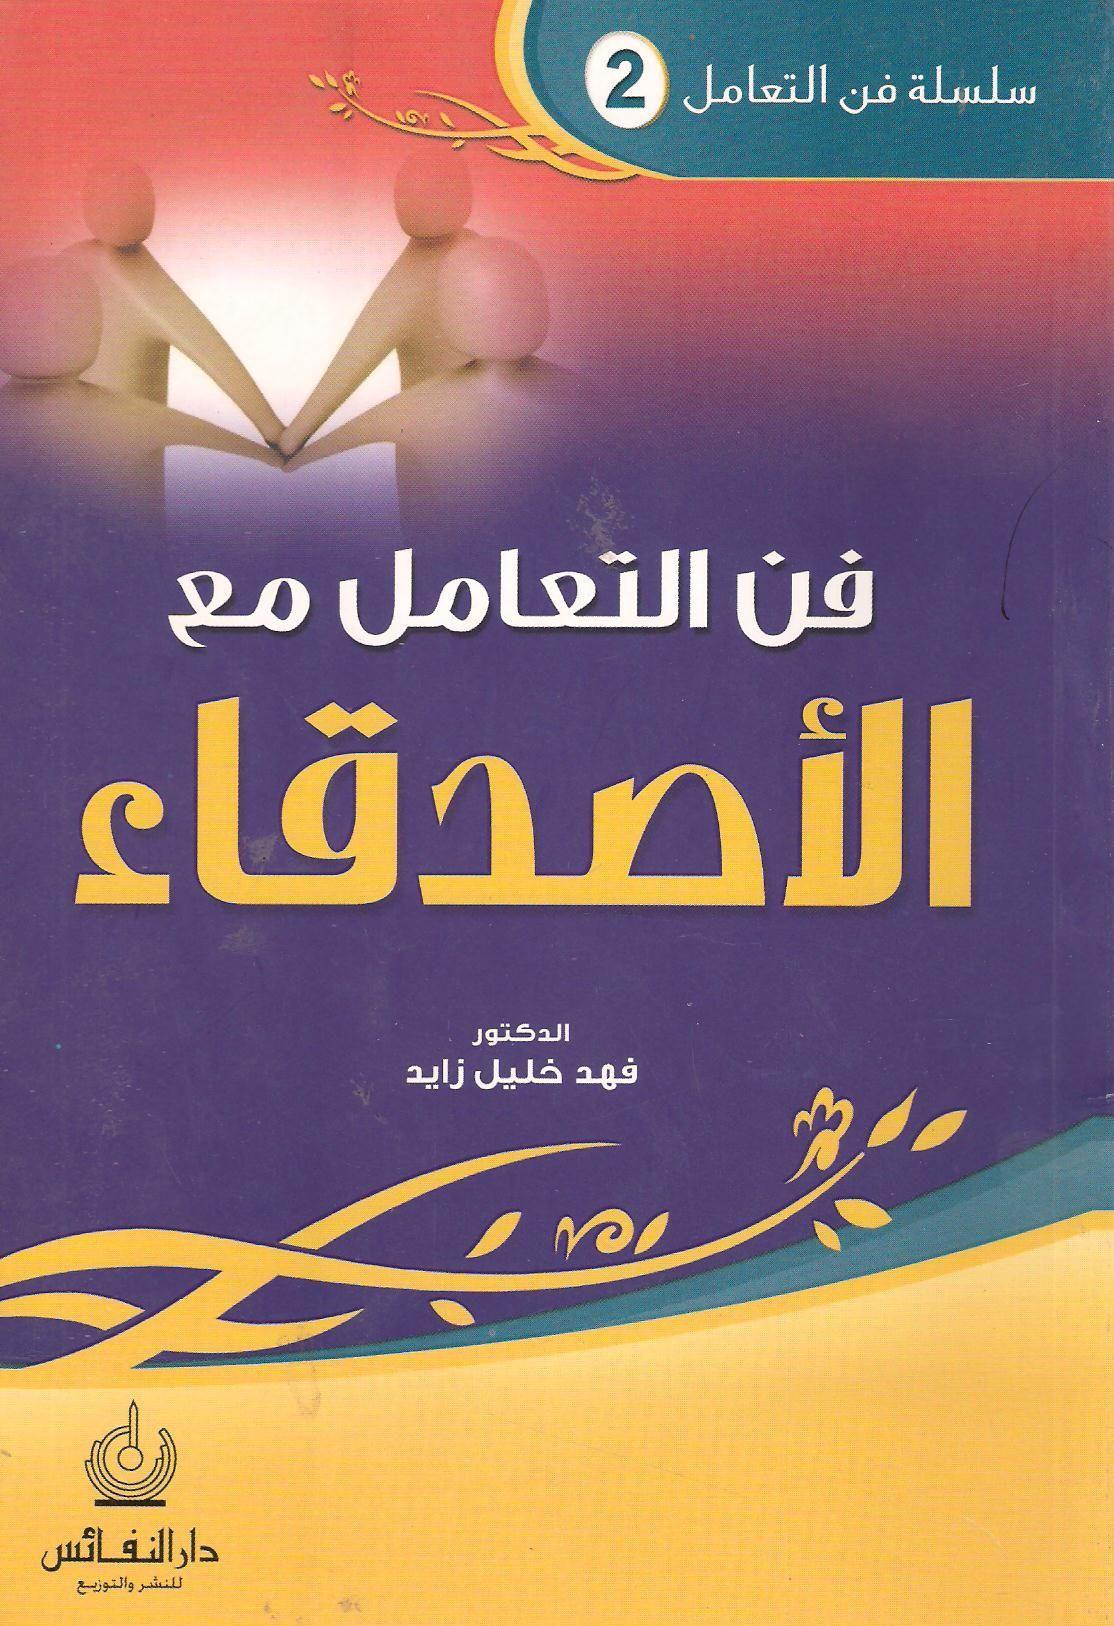 Pin By Abdulla Alansari On أفضل ما قرأت فى علم الاتصال وتحليل الأنماط البشرية Arabic Books Good Books Pdf Books Reading